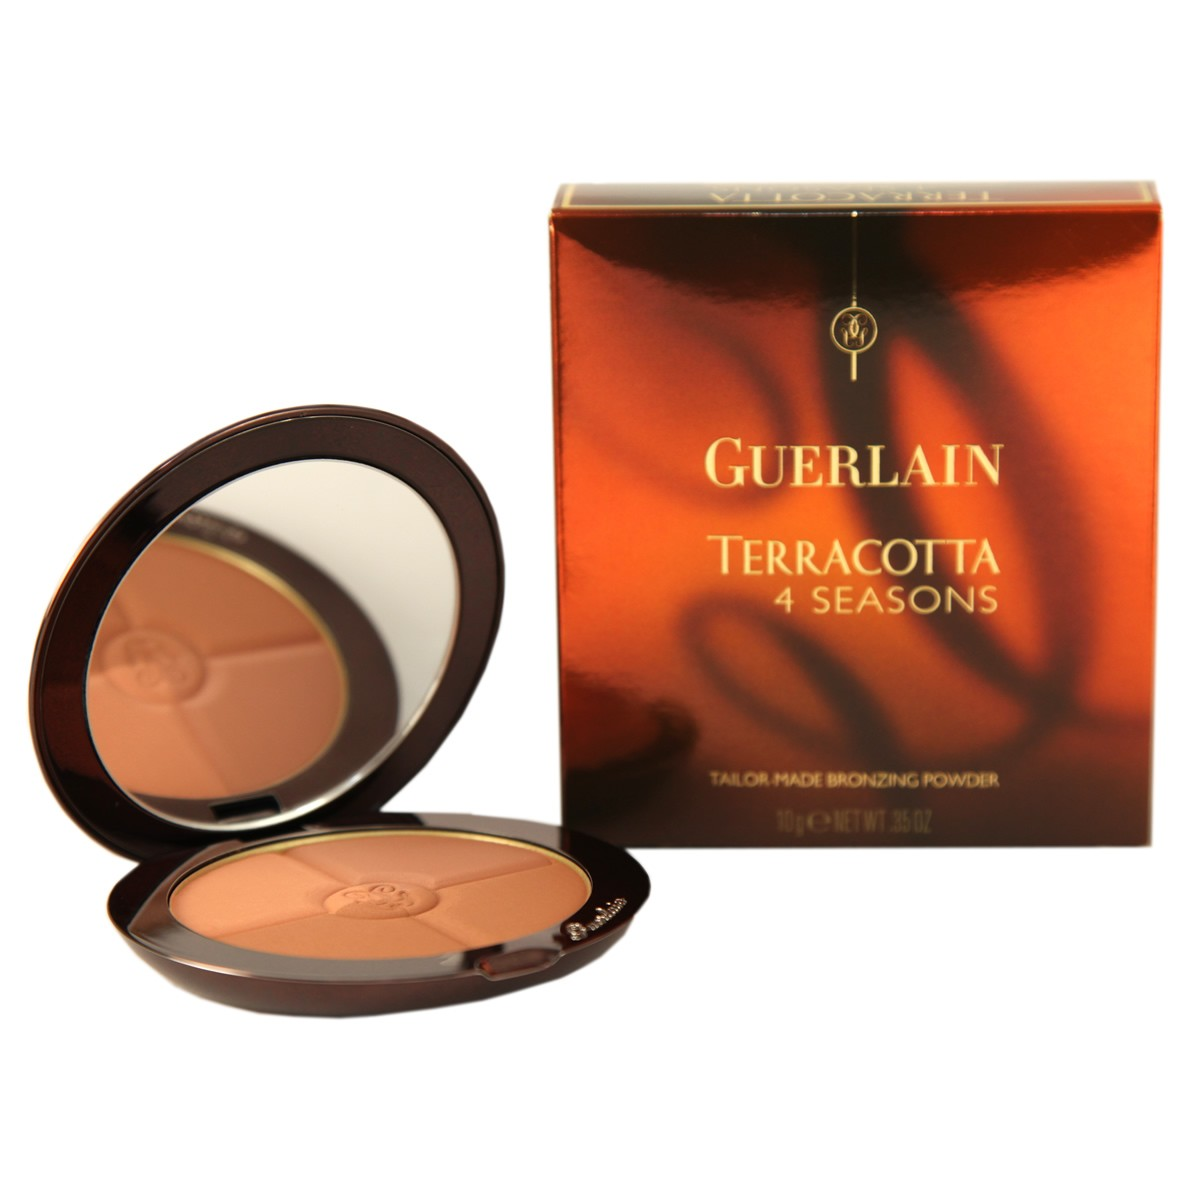 Guerlain Terracotta 4 Seasons Tailor-Made Bronzing Powder